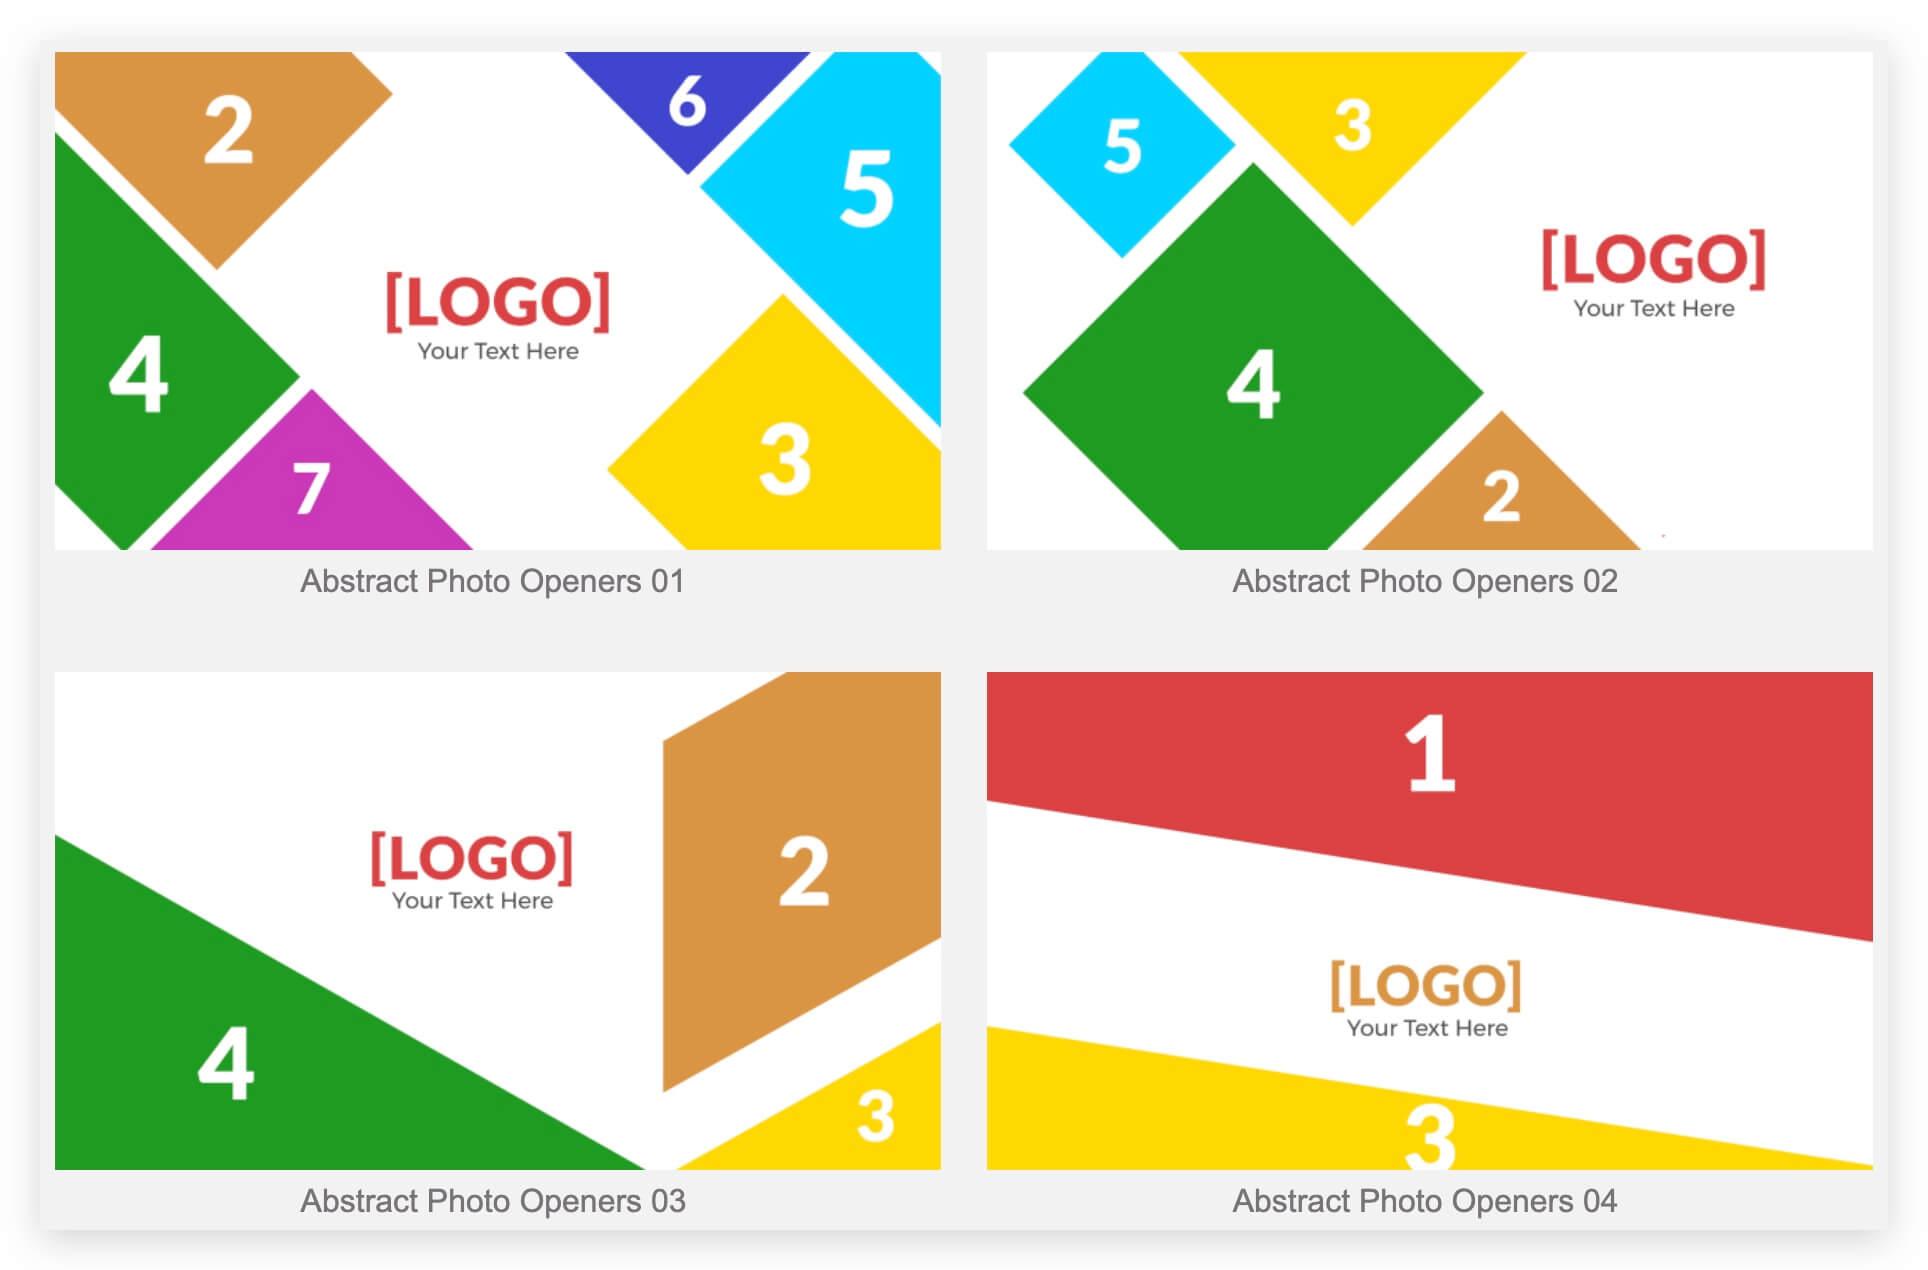 Fcpx插件 10组多图拼接徽标LOGO展示模板 分屏样式 Abstract Photo Openers